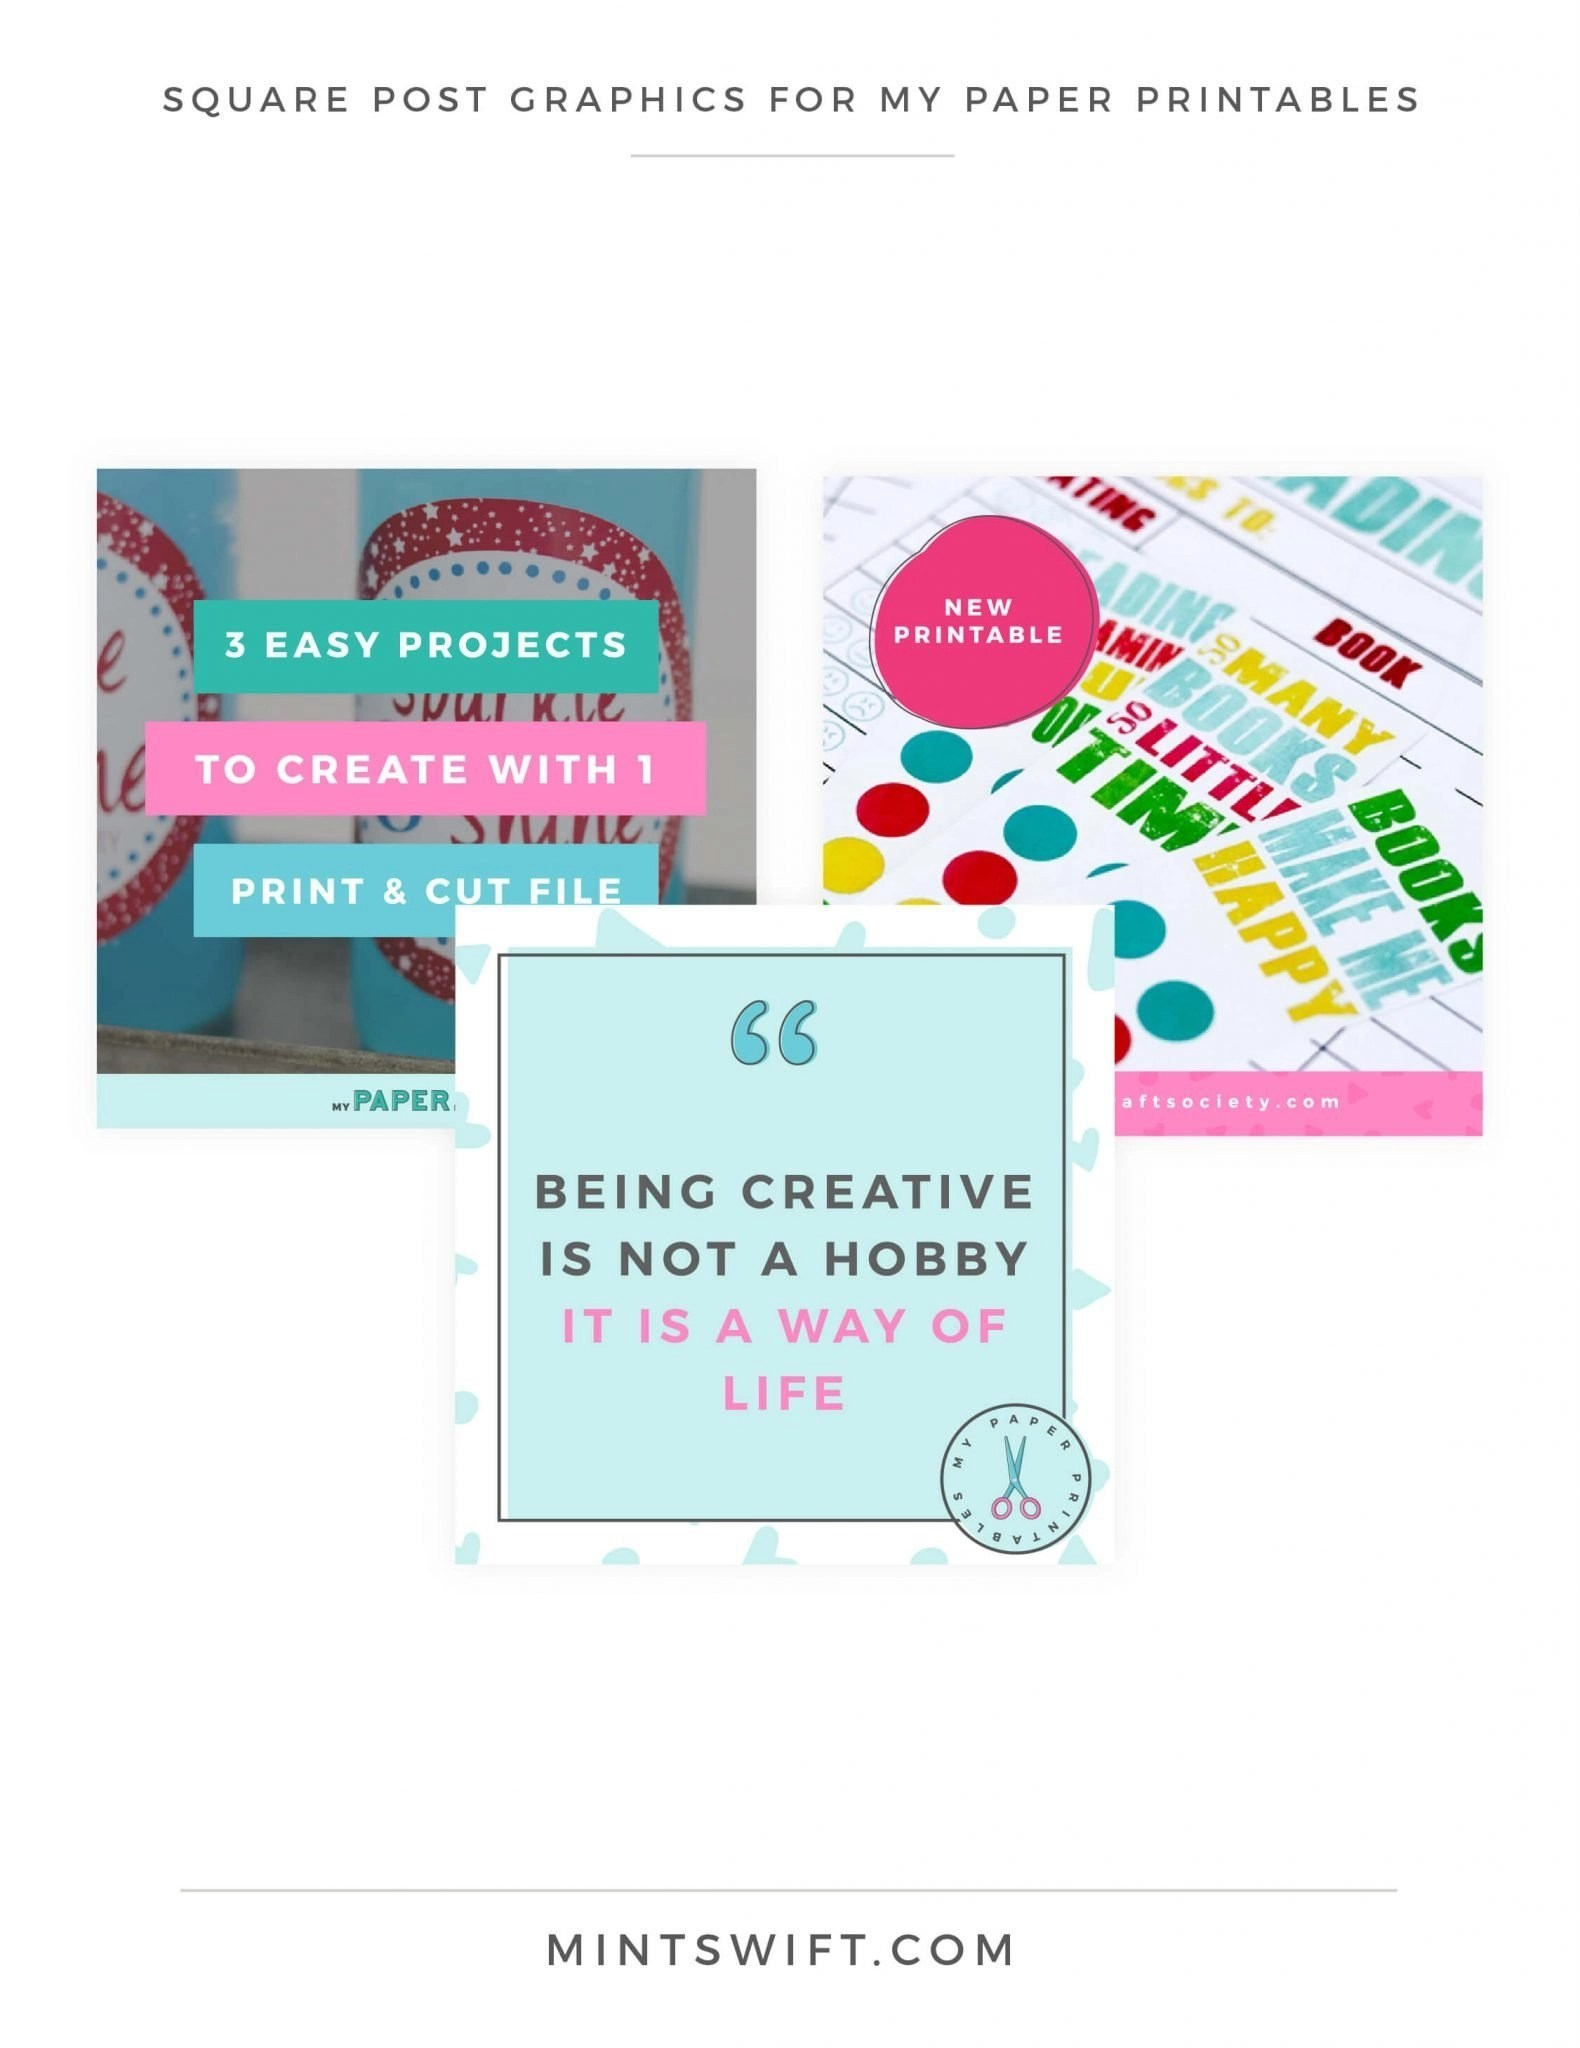 My Paper Printables - Square Post Graphics - Brand Design - MintSwift